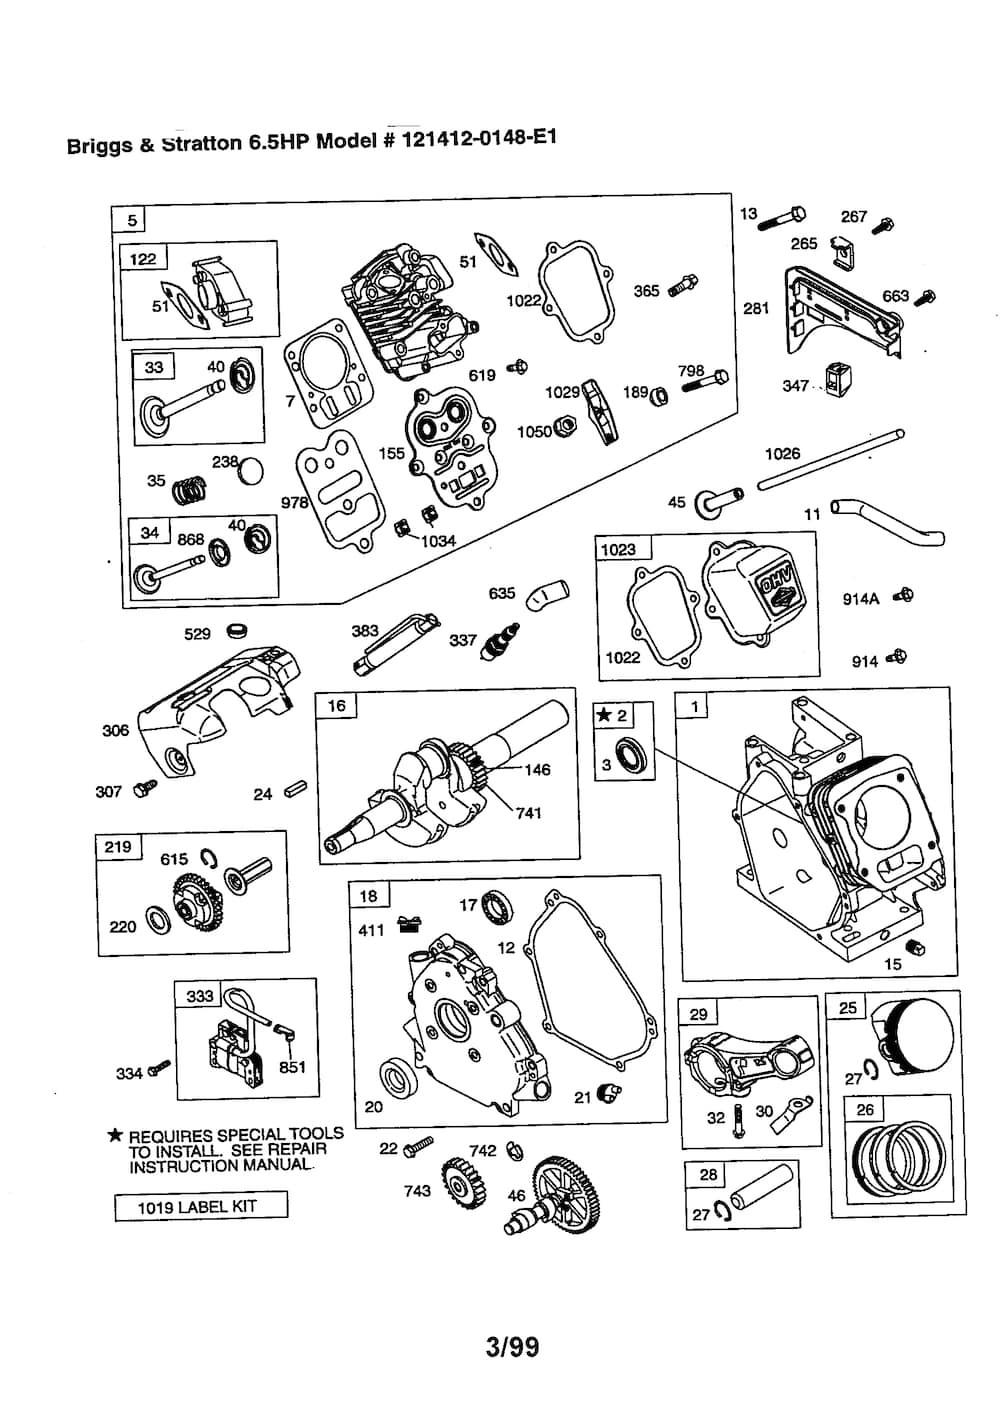 Briggs & Stratton Engine Parts and Diagrams Briggs & Stratton Engine Parts and Diagrams Of Briggs & Stratton Engine Parts and Diagrams